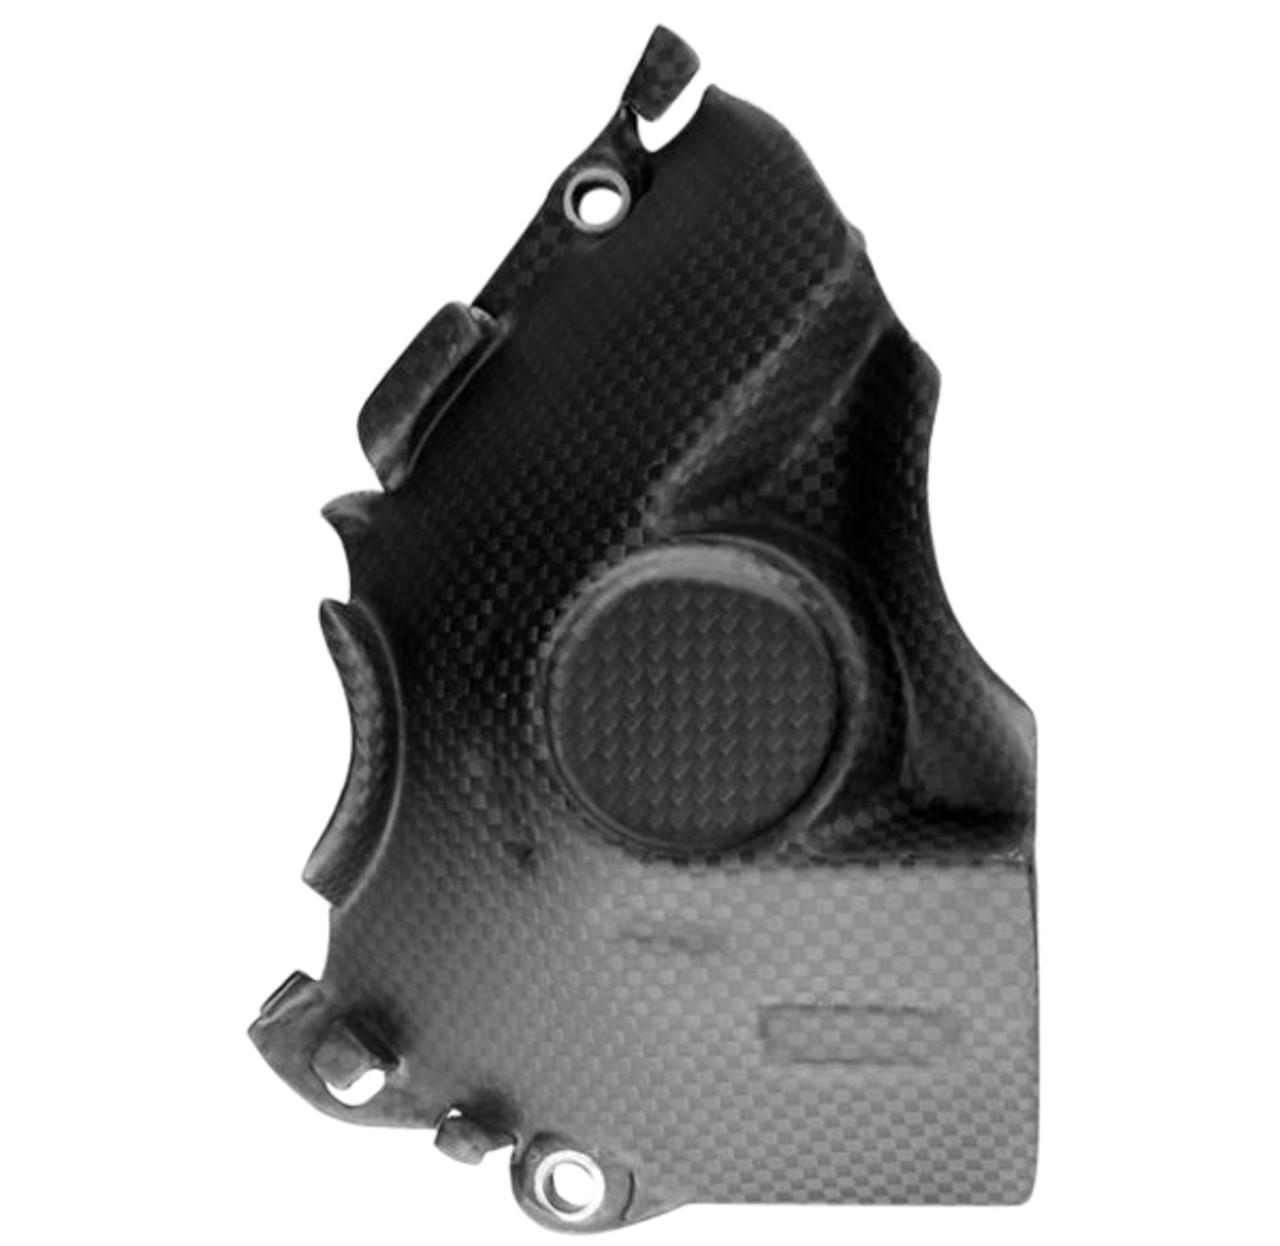 Sprocket Cover in Matte Plain Weave Carbon Fiber for Ducati Multistrada 1200 2015-2017, Enduro 1200/1260